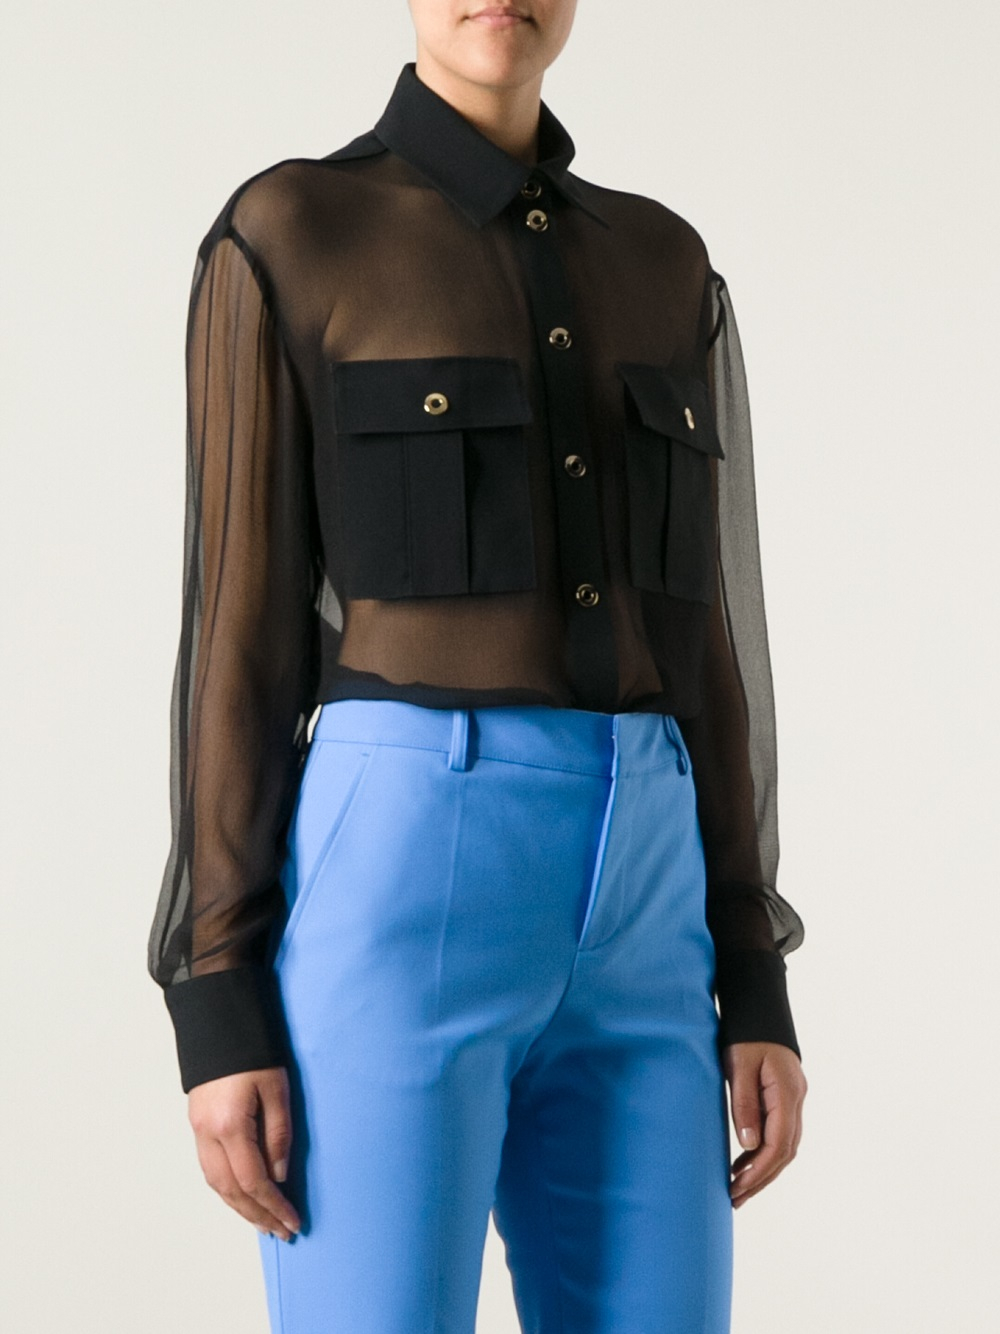 fe6862f33ed69 Emanuel Ungaro Sheer Shirt in Black - Lyst